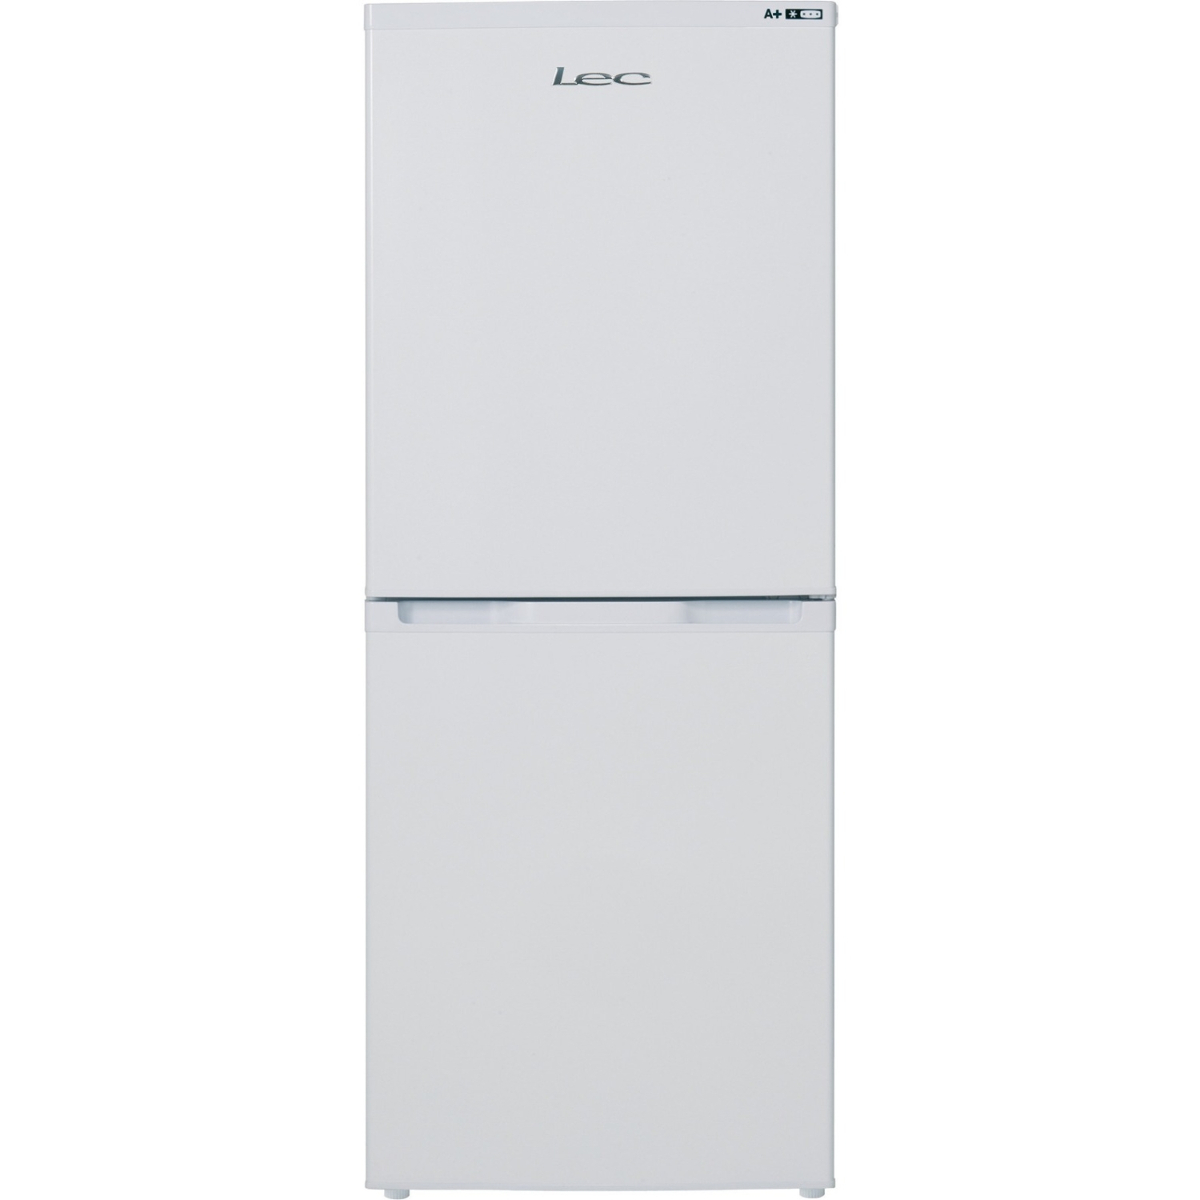 Lec TF55142W Tall Fridge Freezer